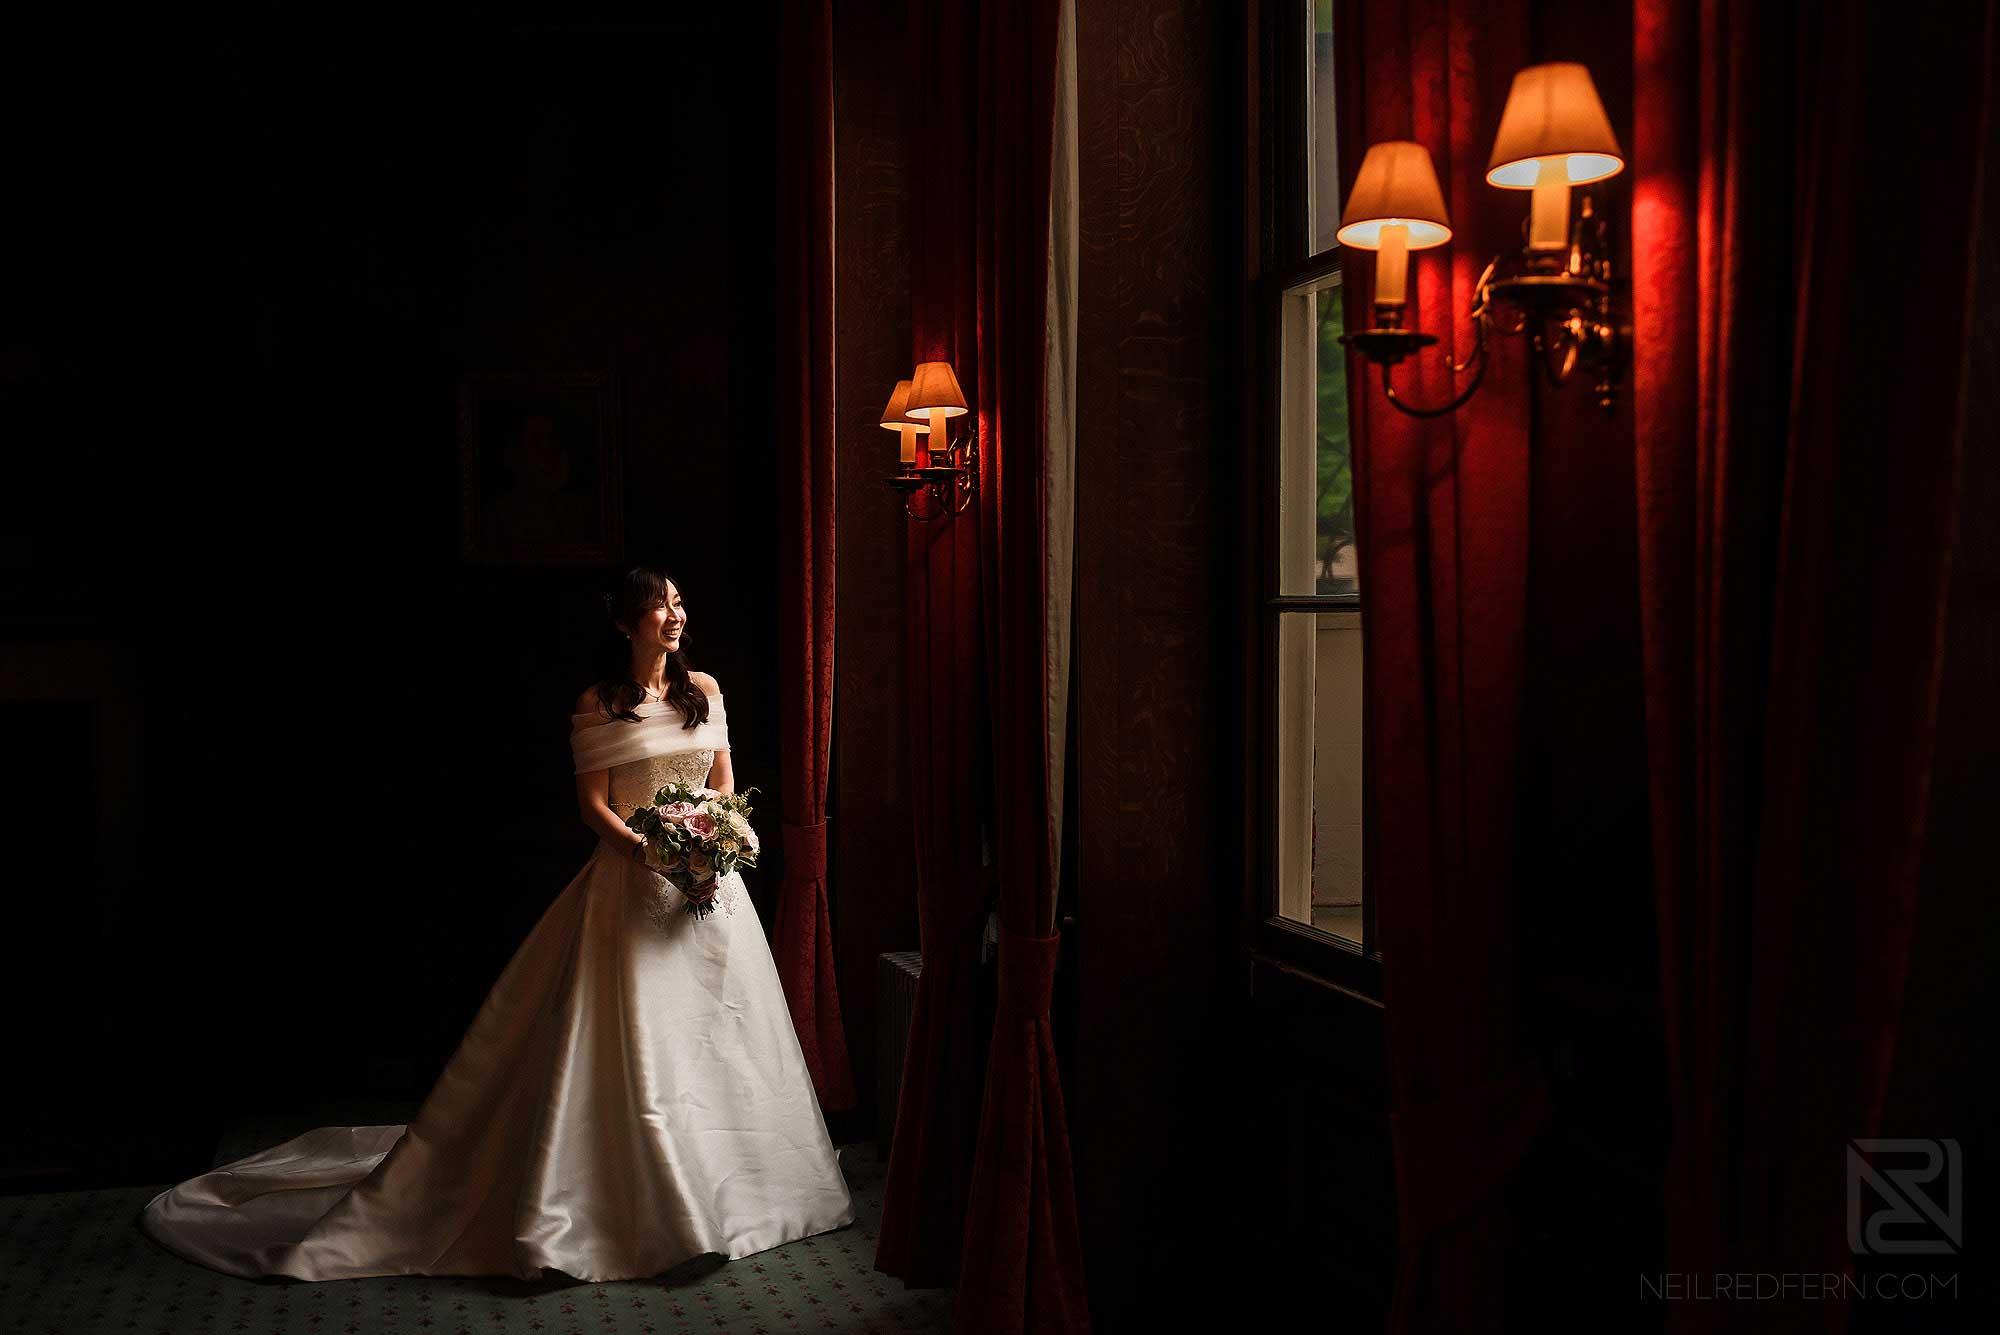 beautiful portrait of Chinese bride